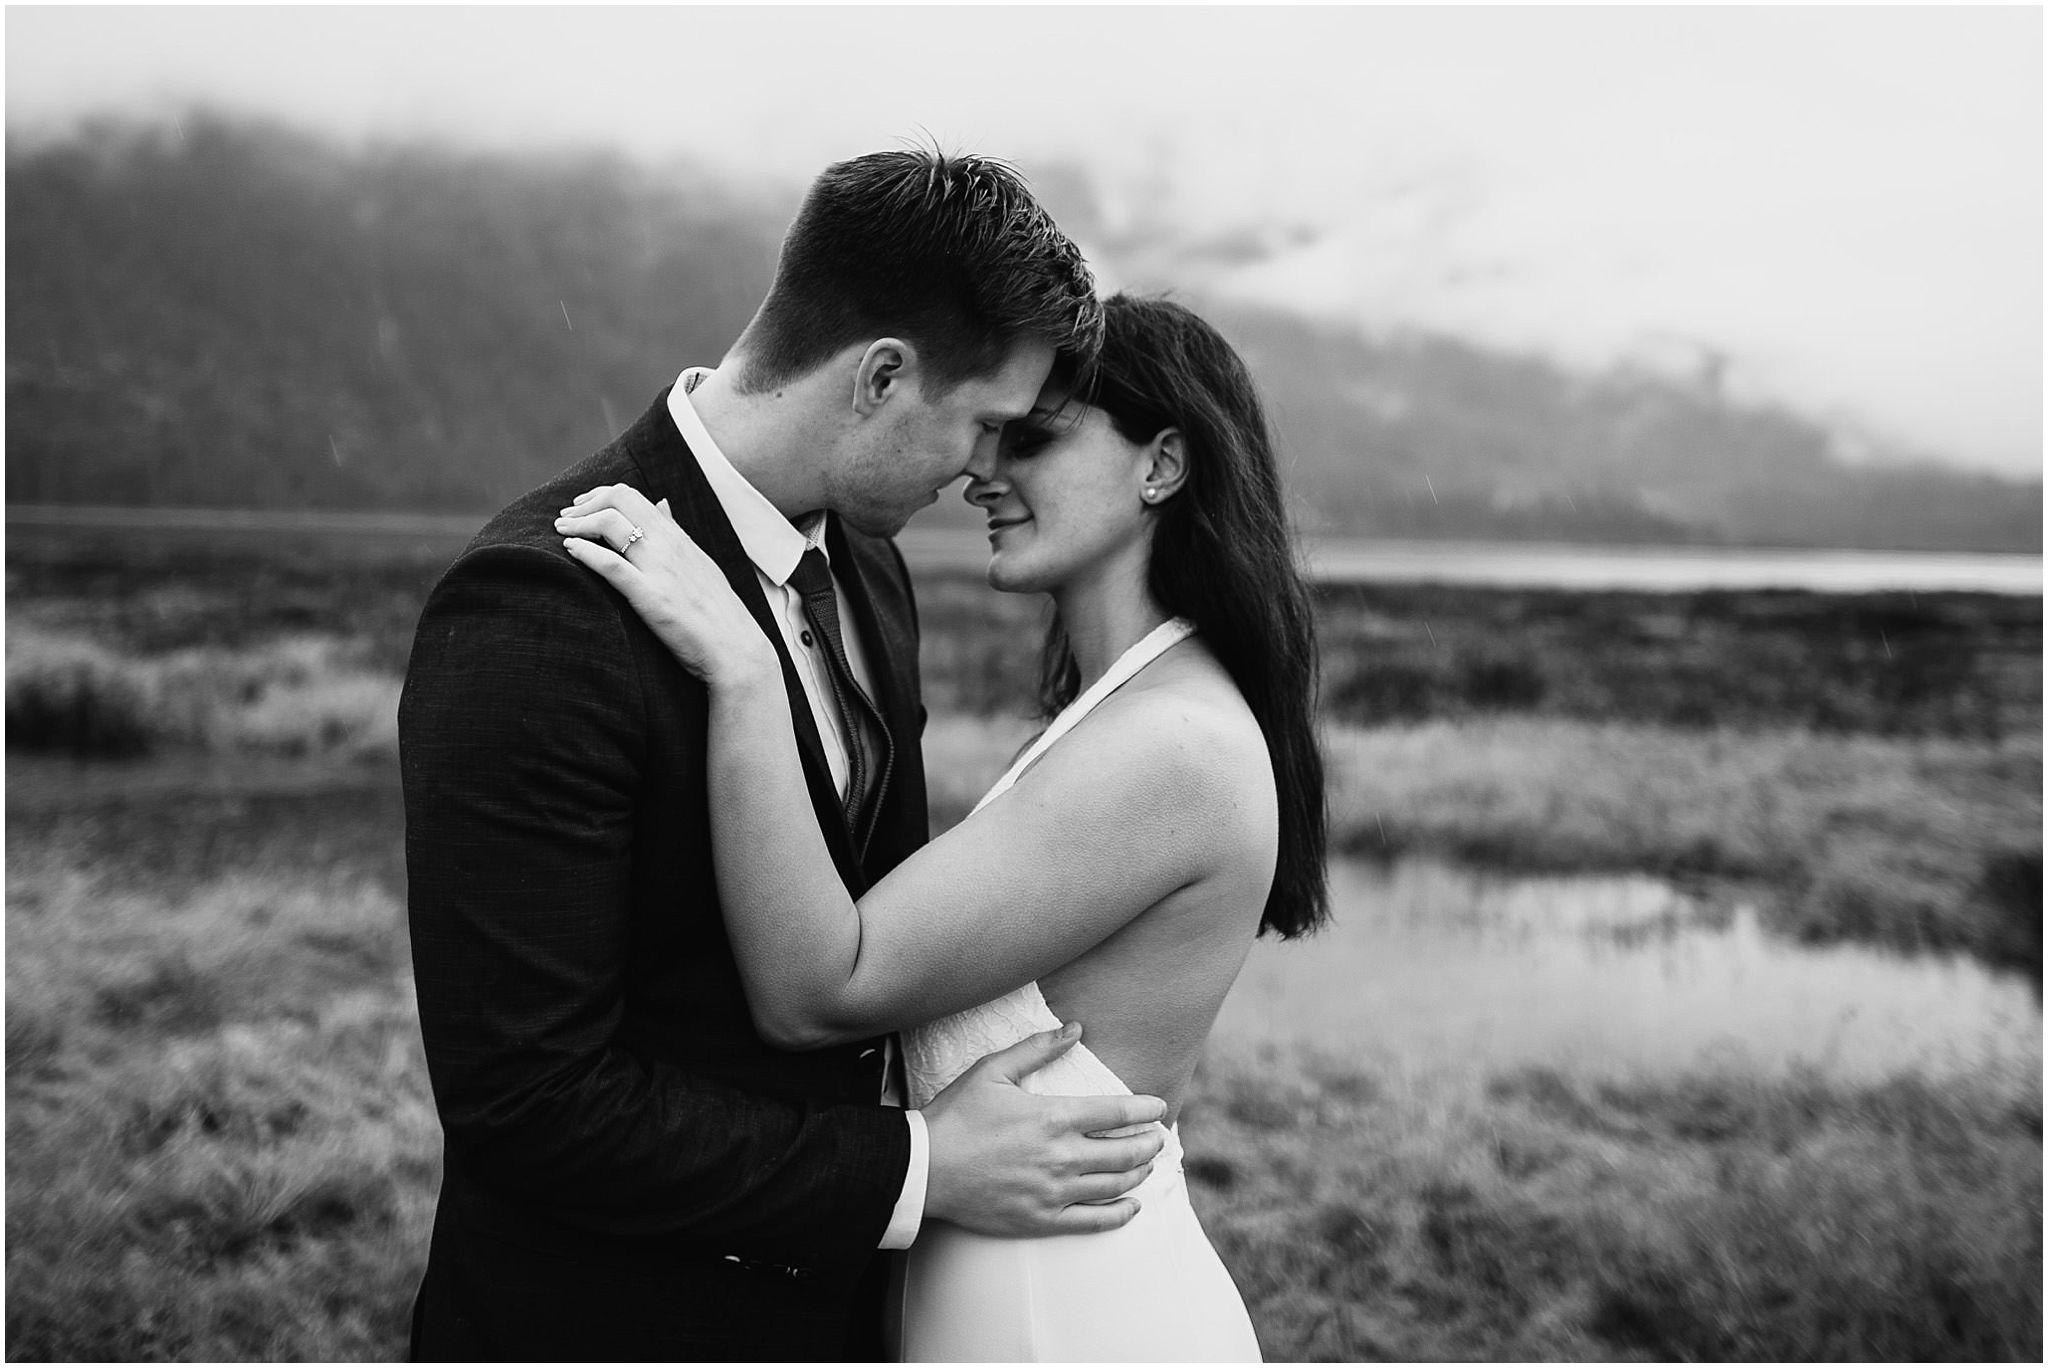 romantic moment between bride groom at pitt lake